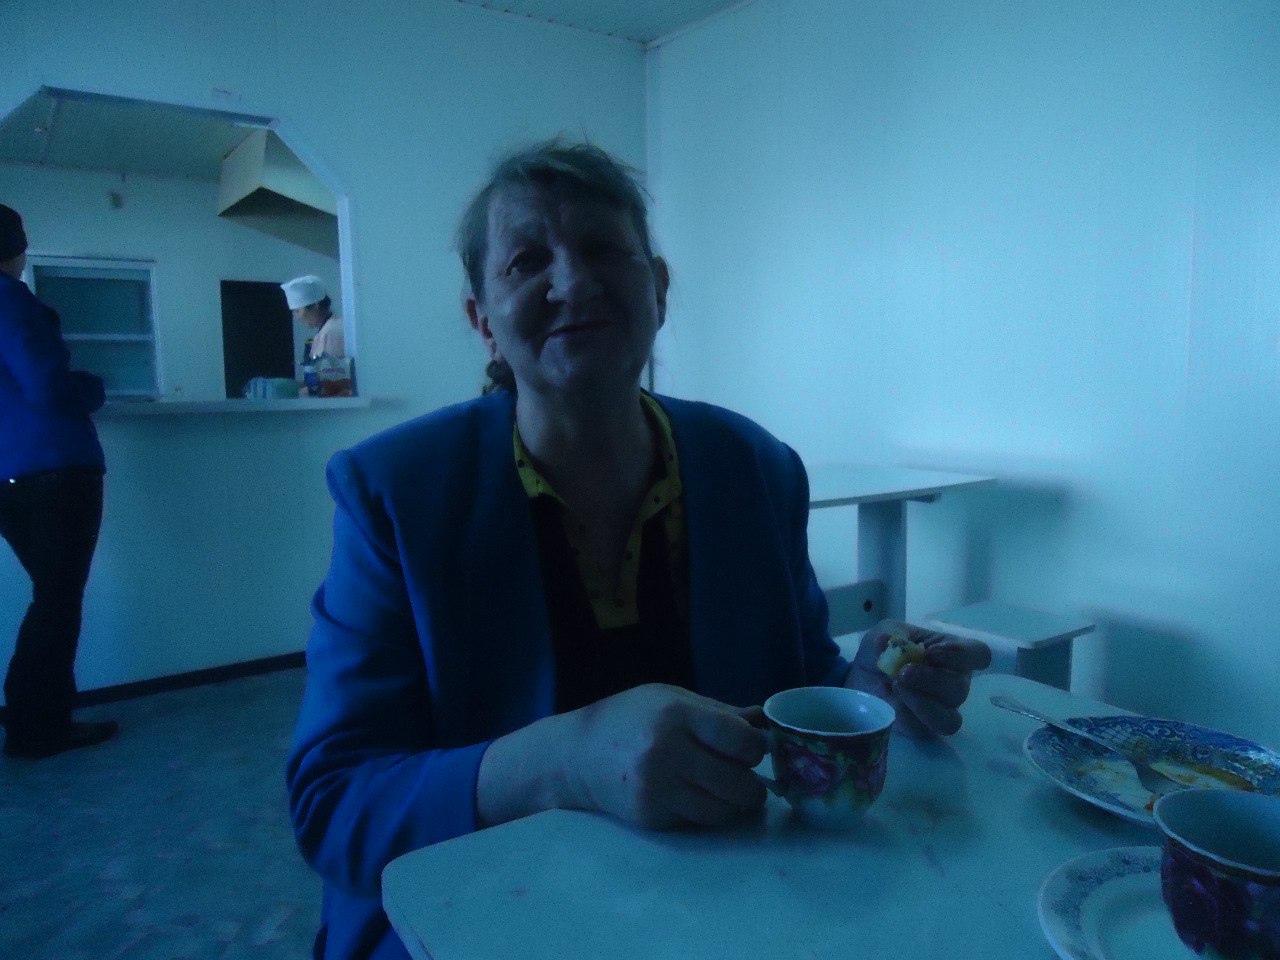 фото из альбома :-)катюша(-: (полянская) №1